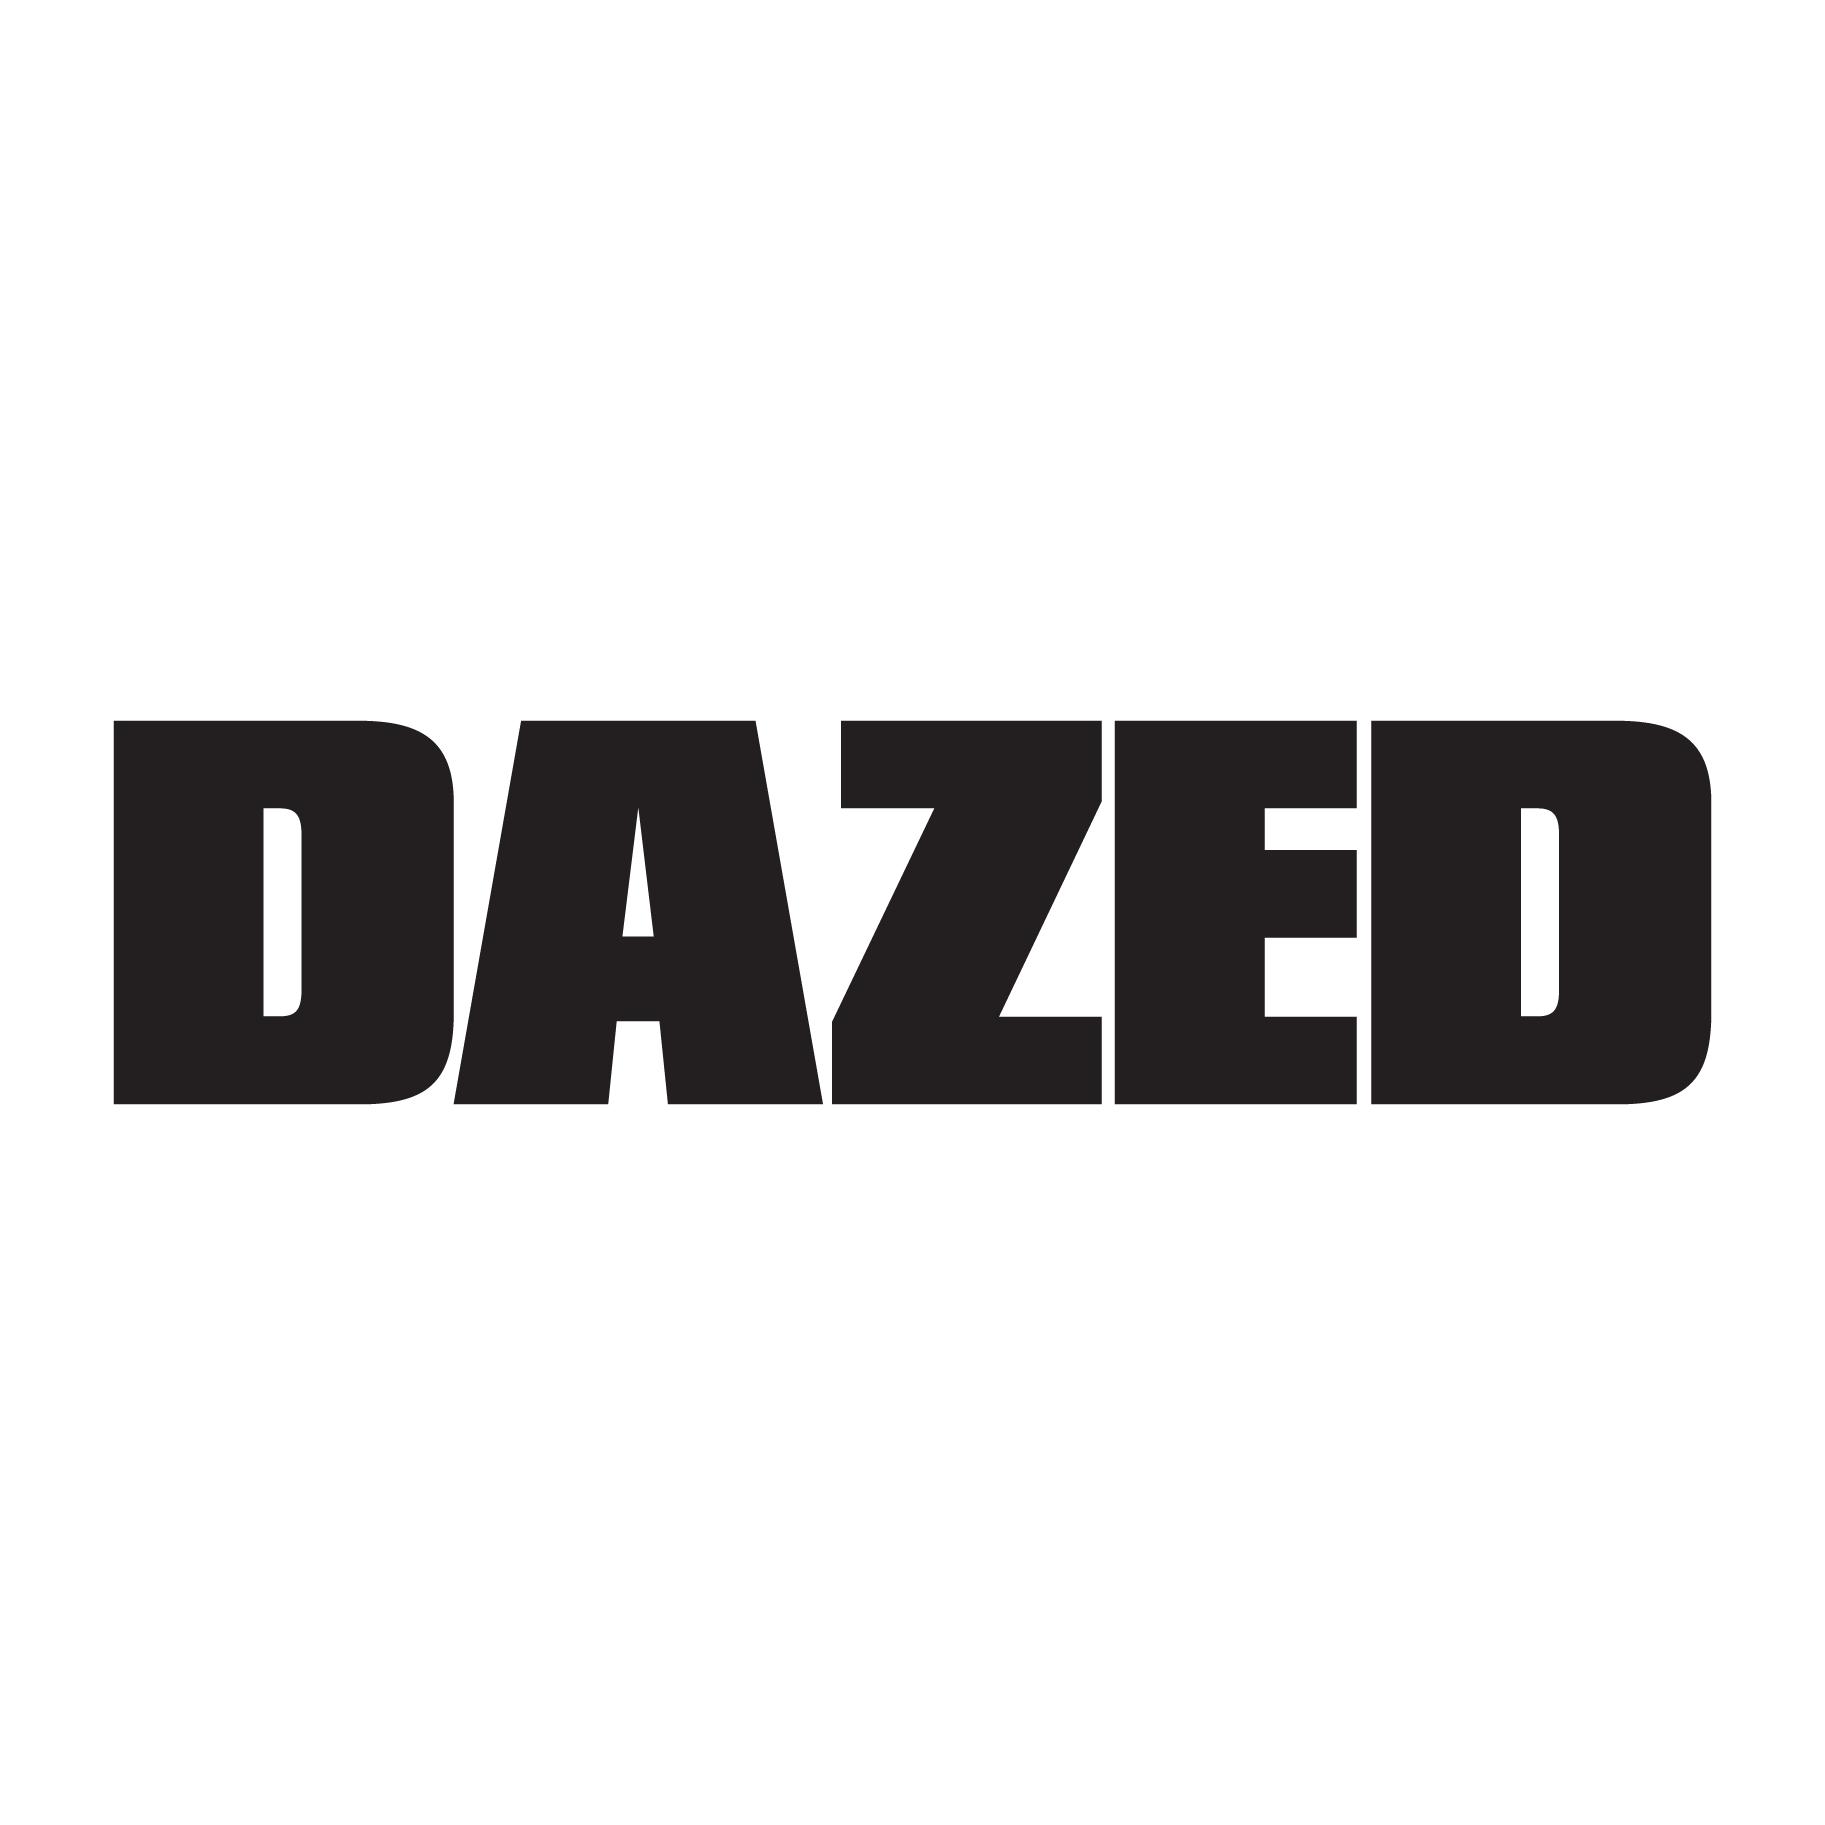 dazeddigital.png